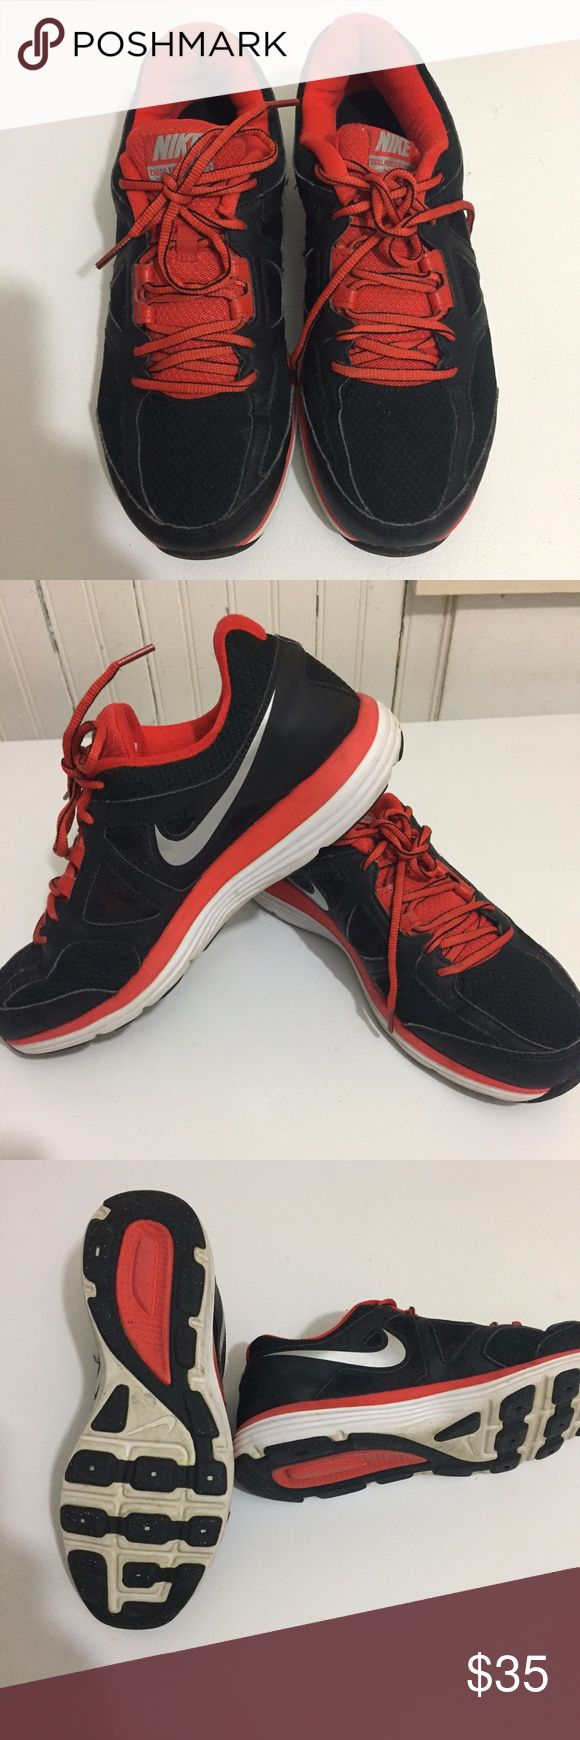 Men's nike sneakers Nike dual fusion sneakers in EUC.  Lot of miles left in this pair. men's size 9. NIKE Shoes Sneakers